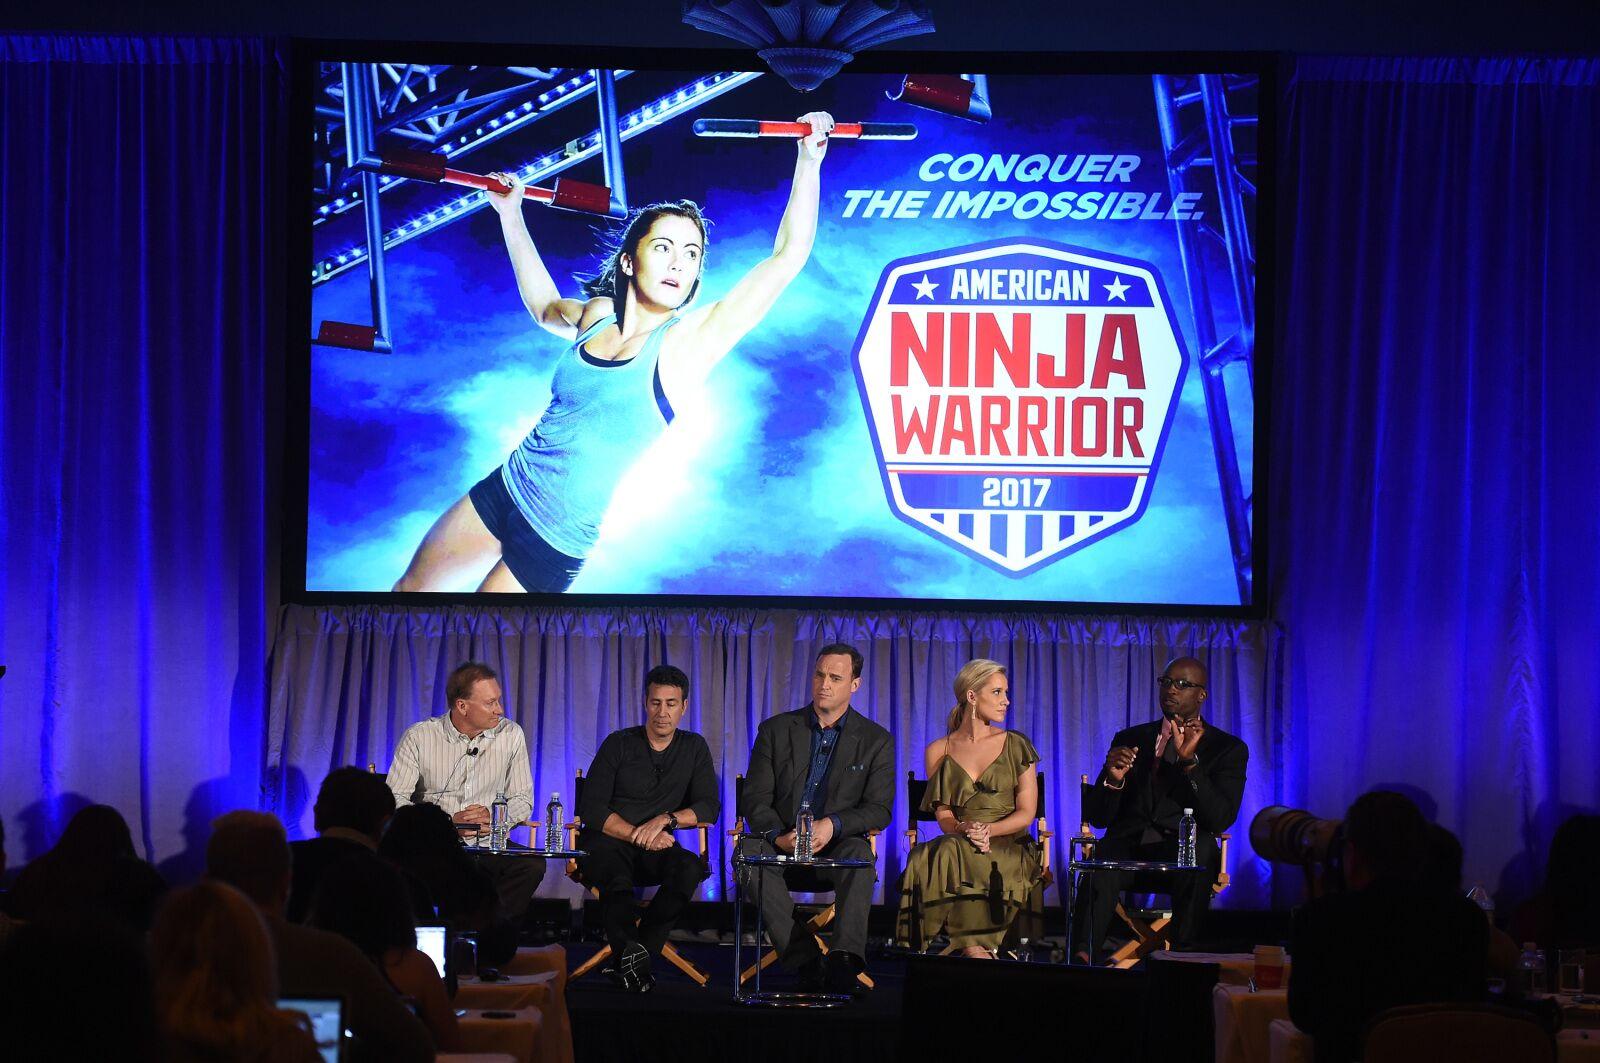 American Ninja Warrior goes to the dogs in Atlanta